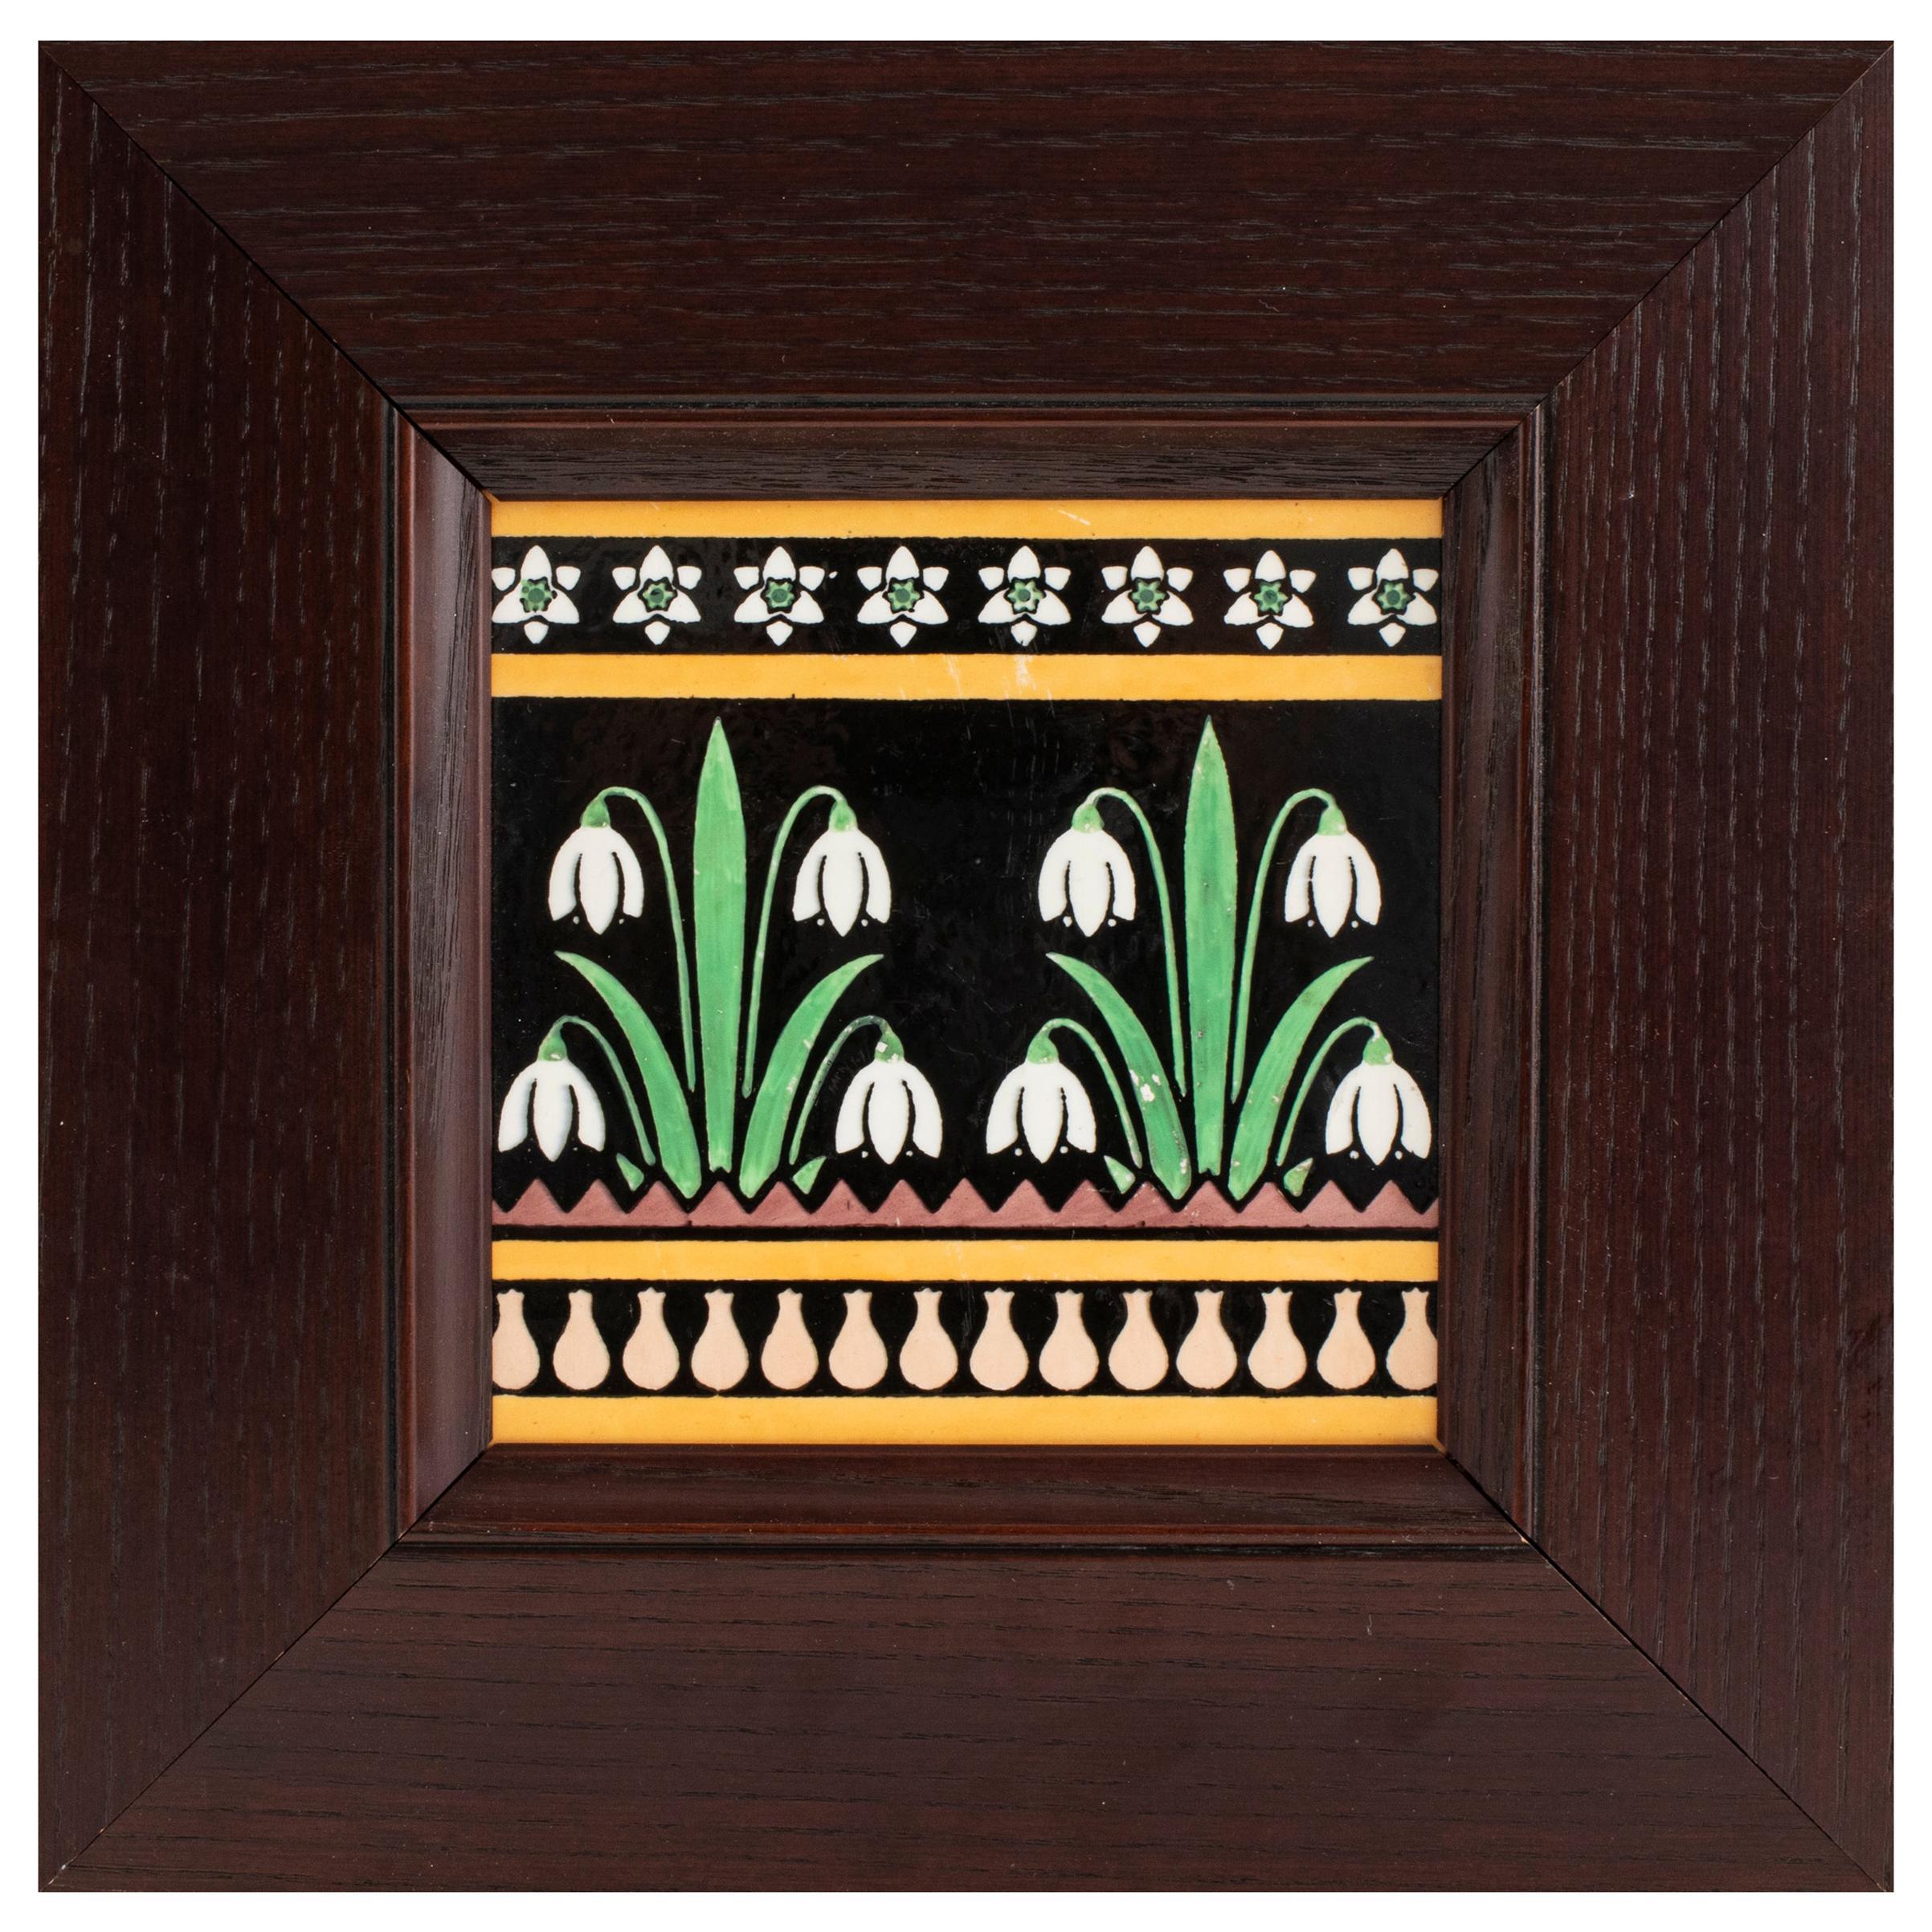 Christopher Dresser for Minton English Arts & Crafts Floral Pottery Tile